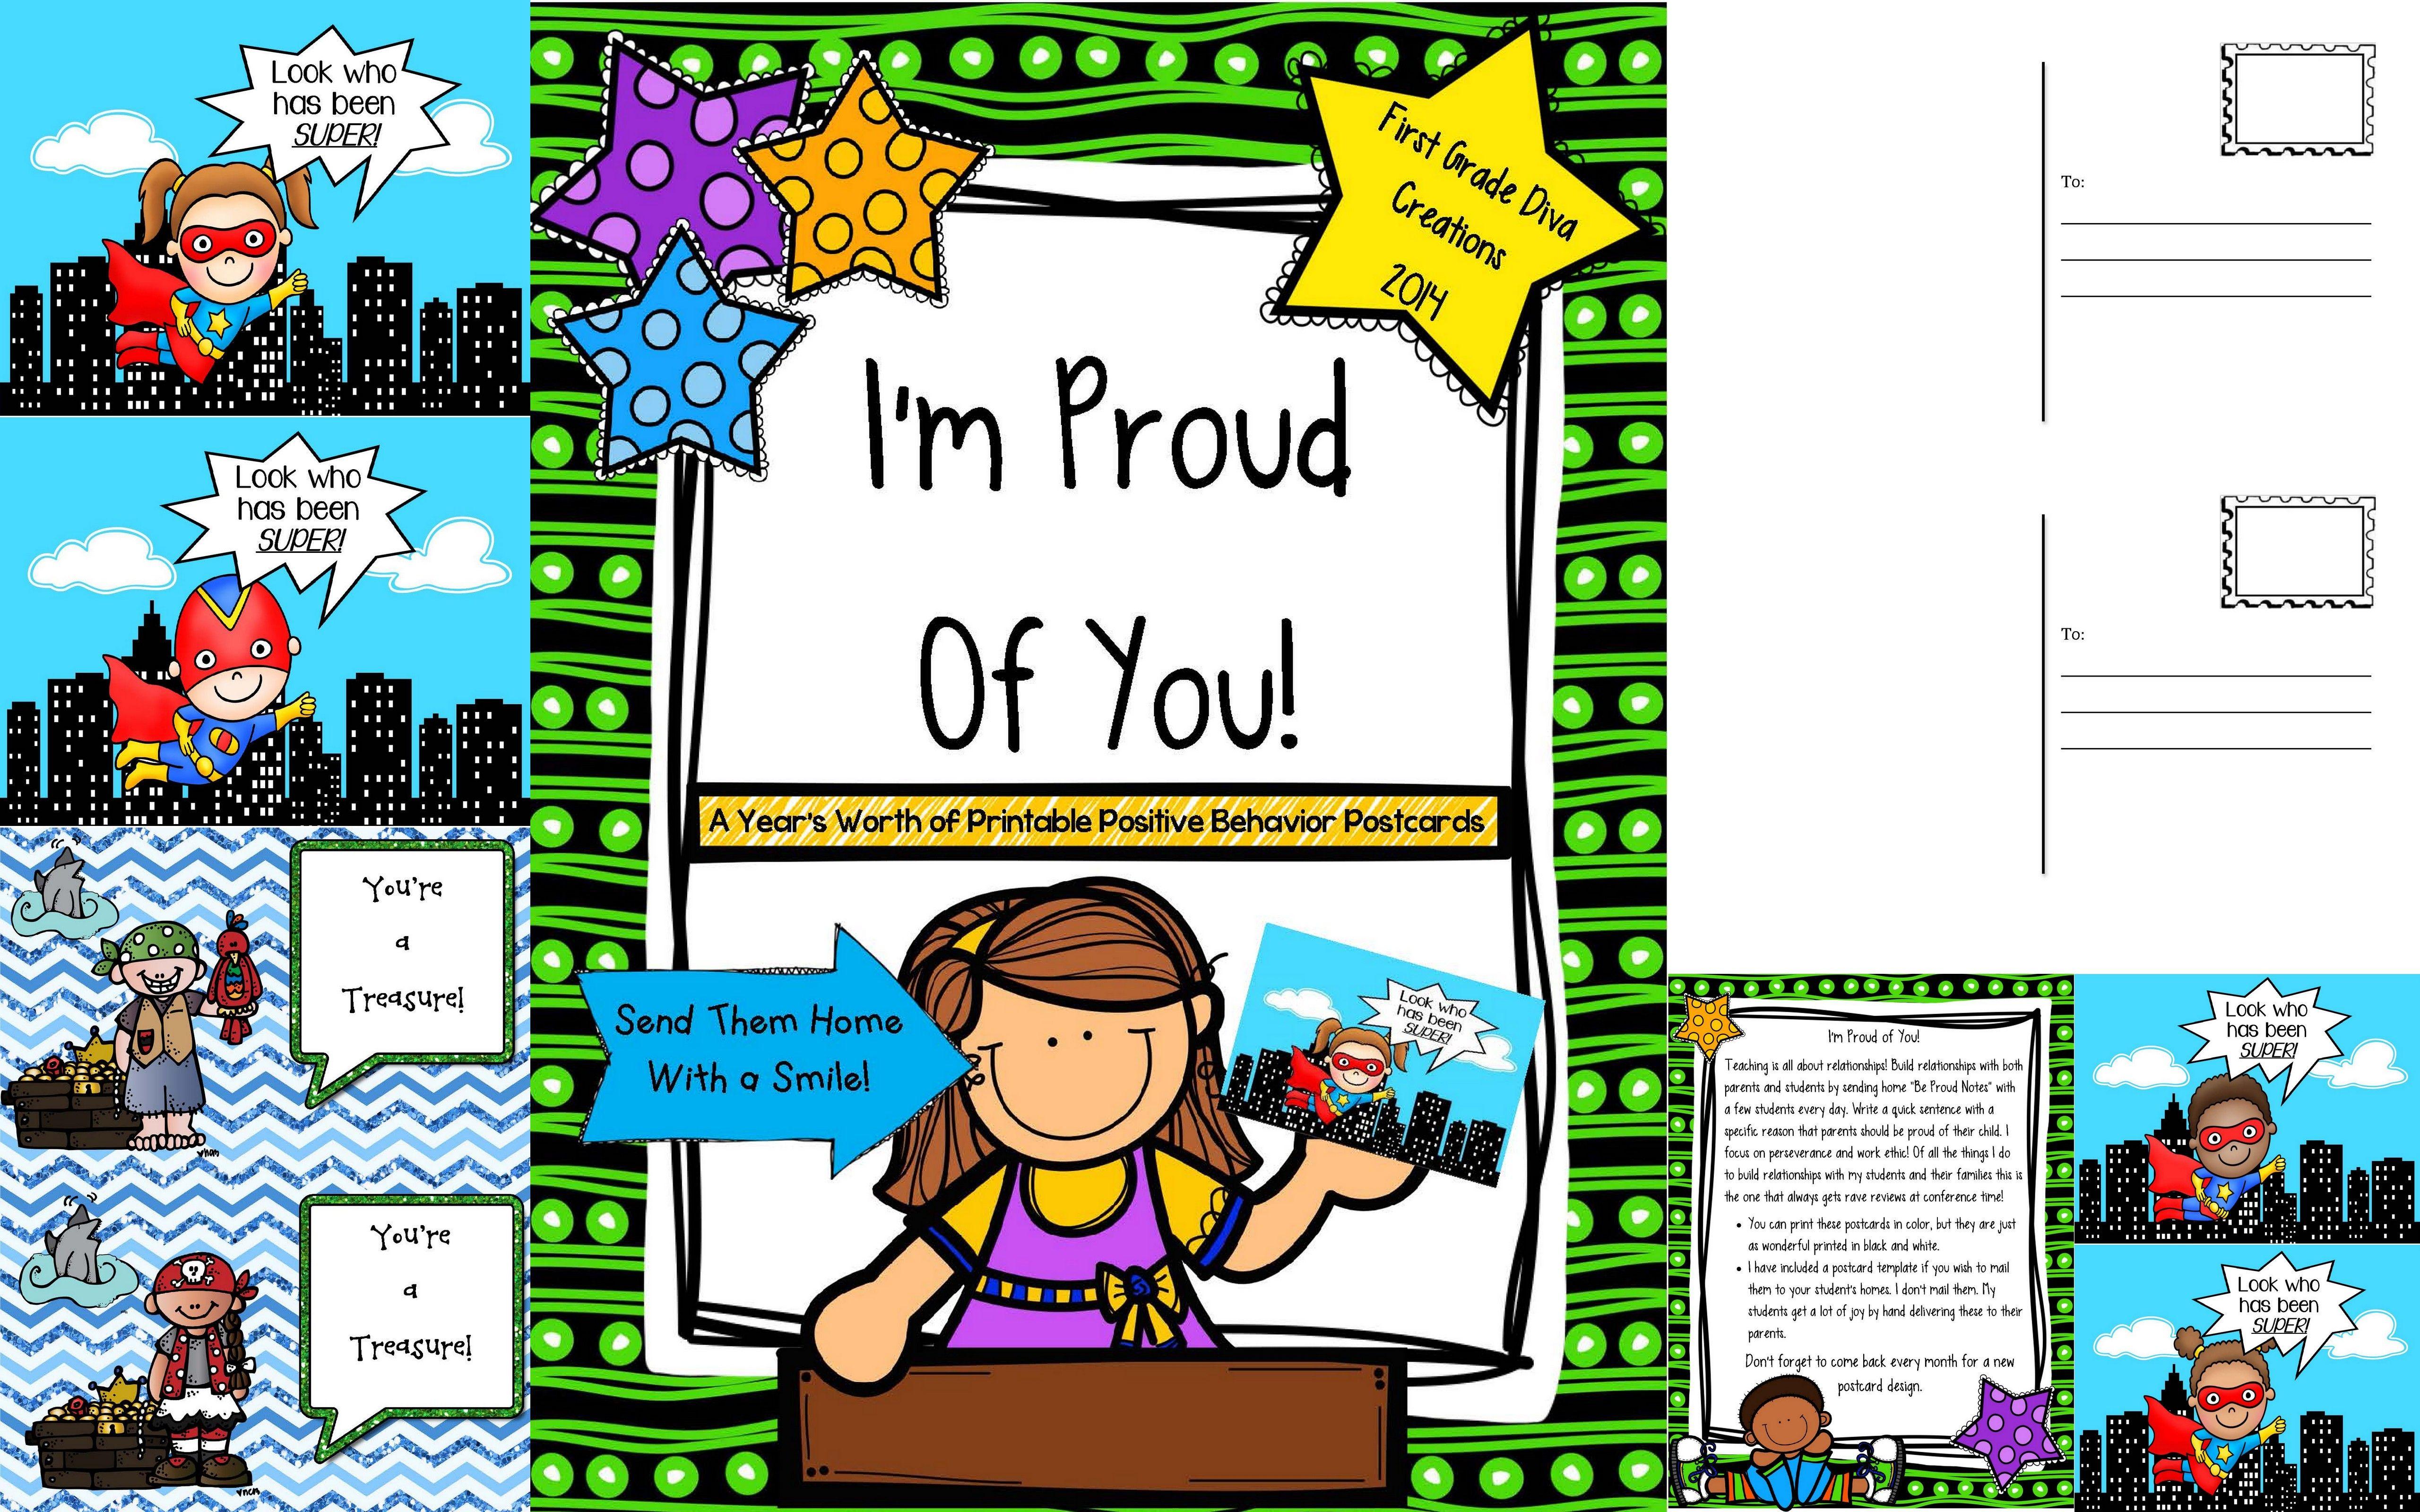 Printable Positive Behavior Postcards